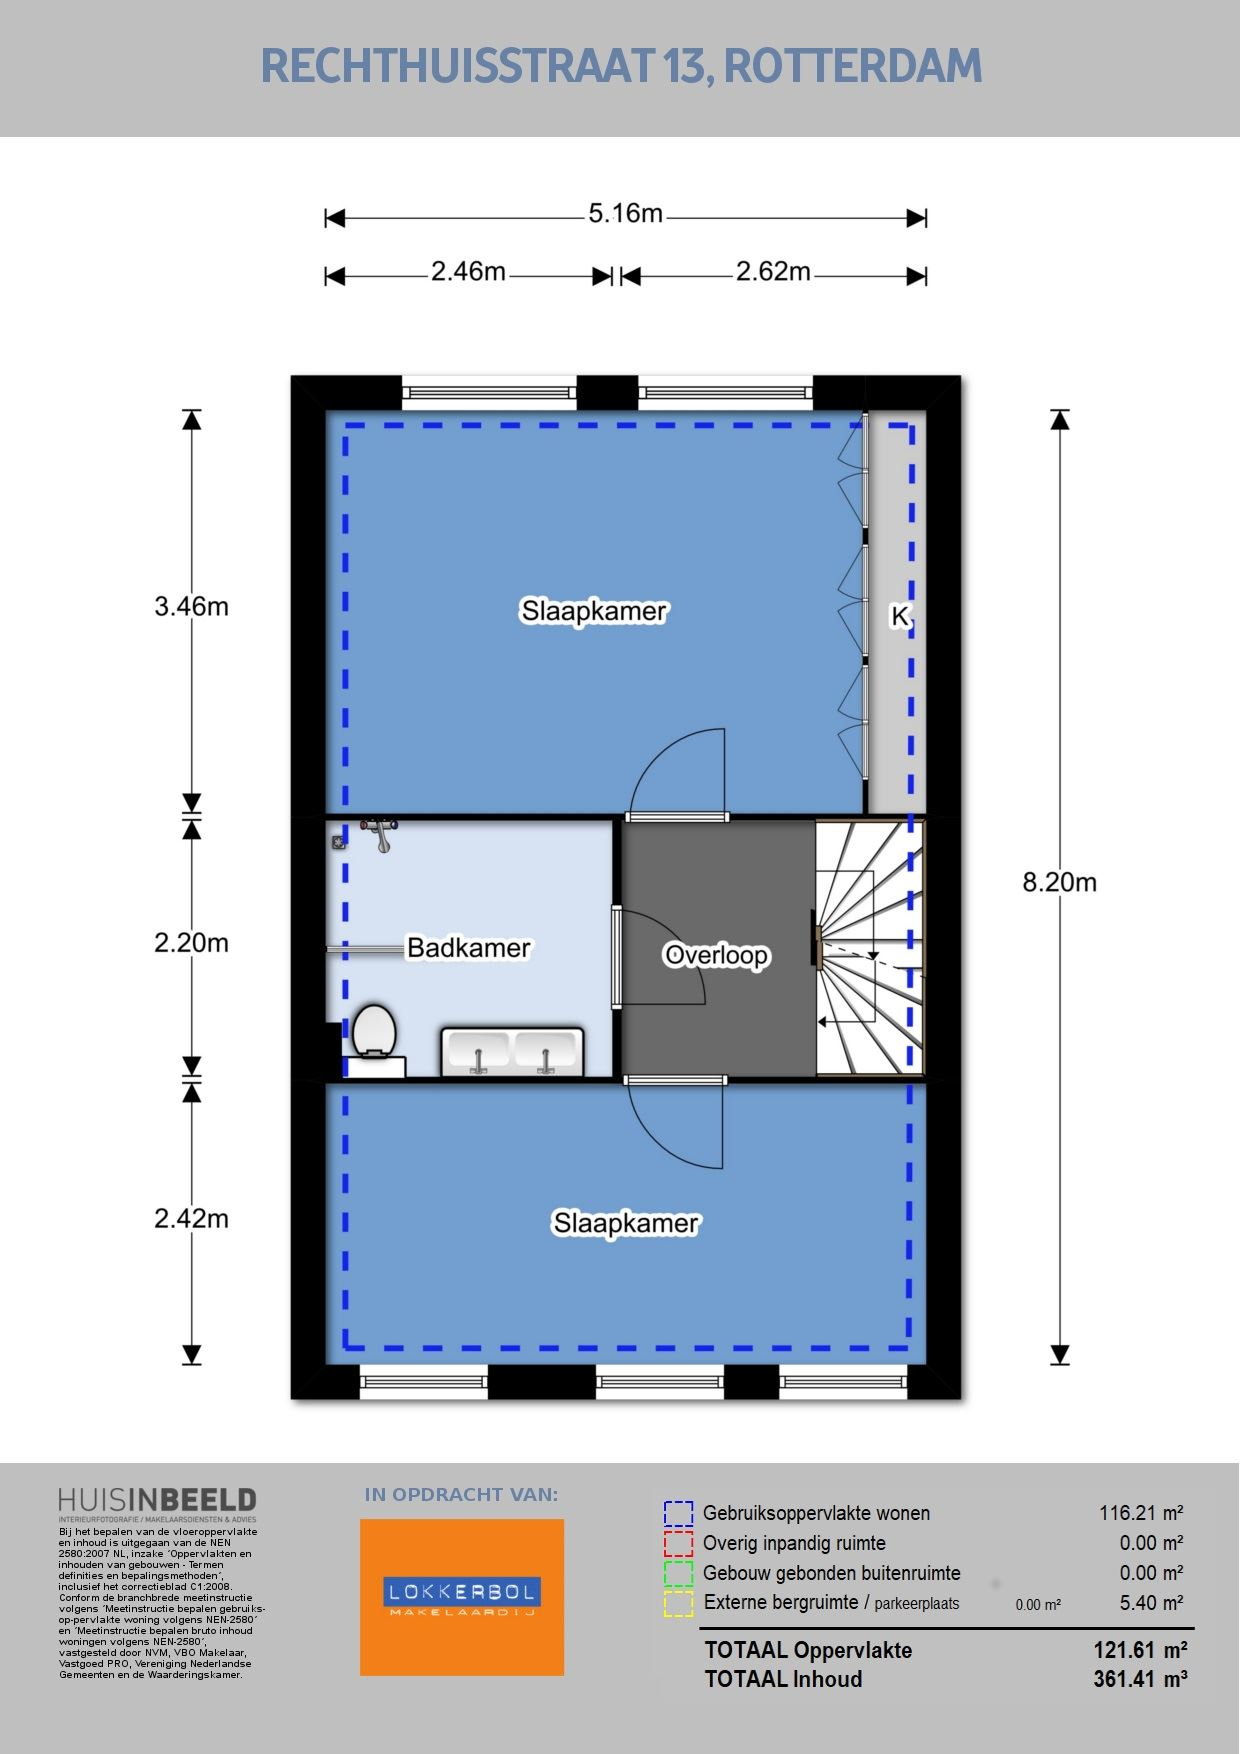 huis te koop rechthuisstraat 13 3072 lh rotterdam funda